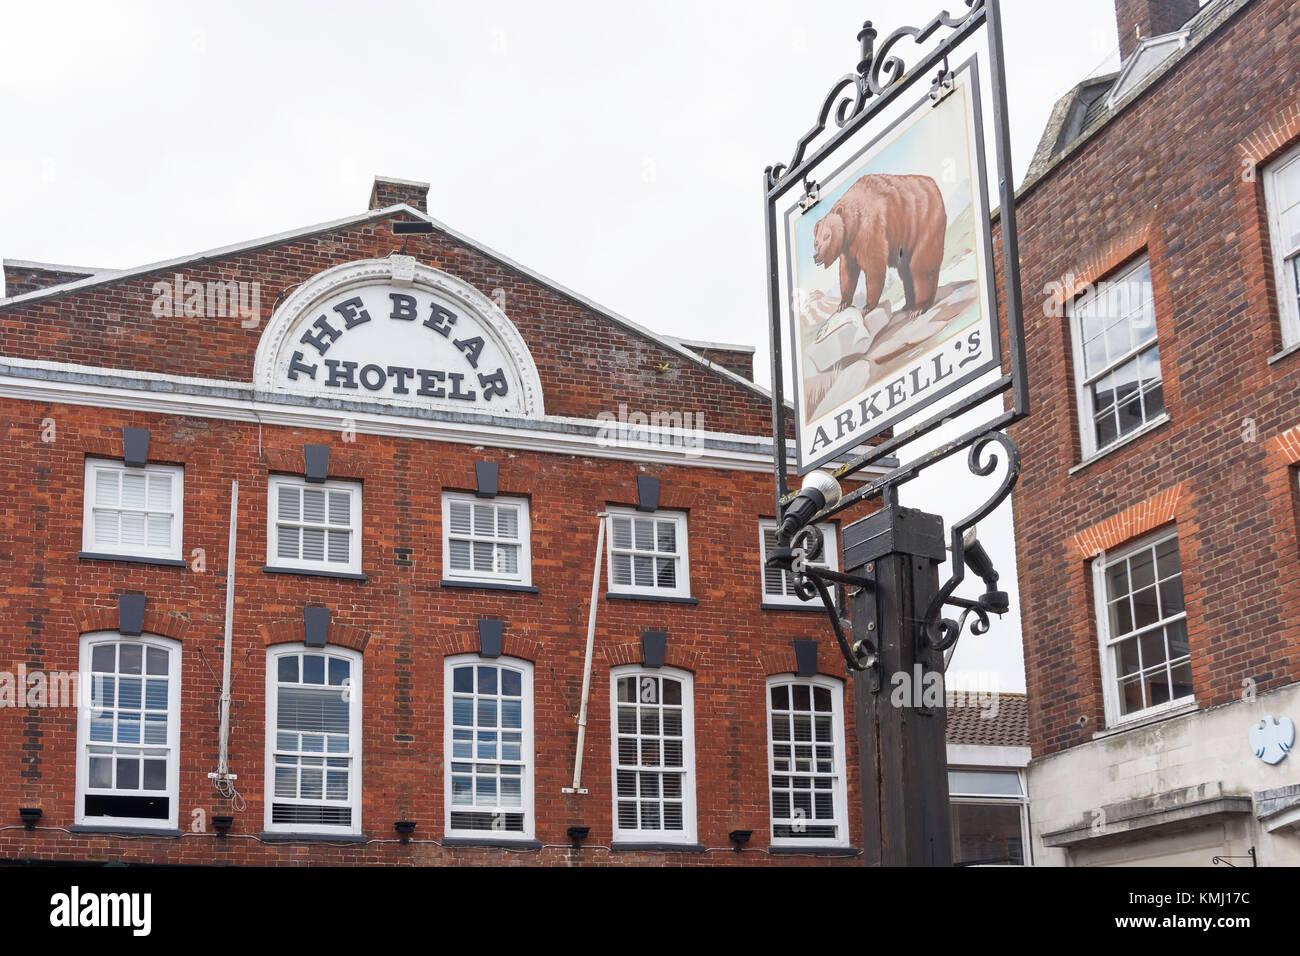 16th century The Bear Hotel, Market Place, Wantage, Oxfordshire, England, United Kingdom - Stock Image